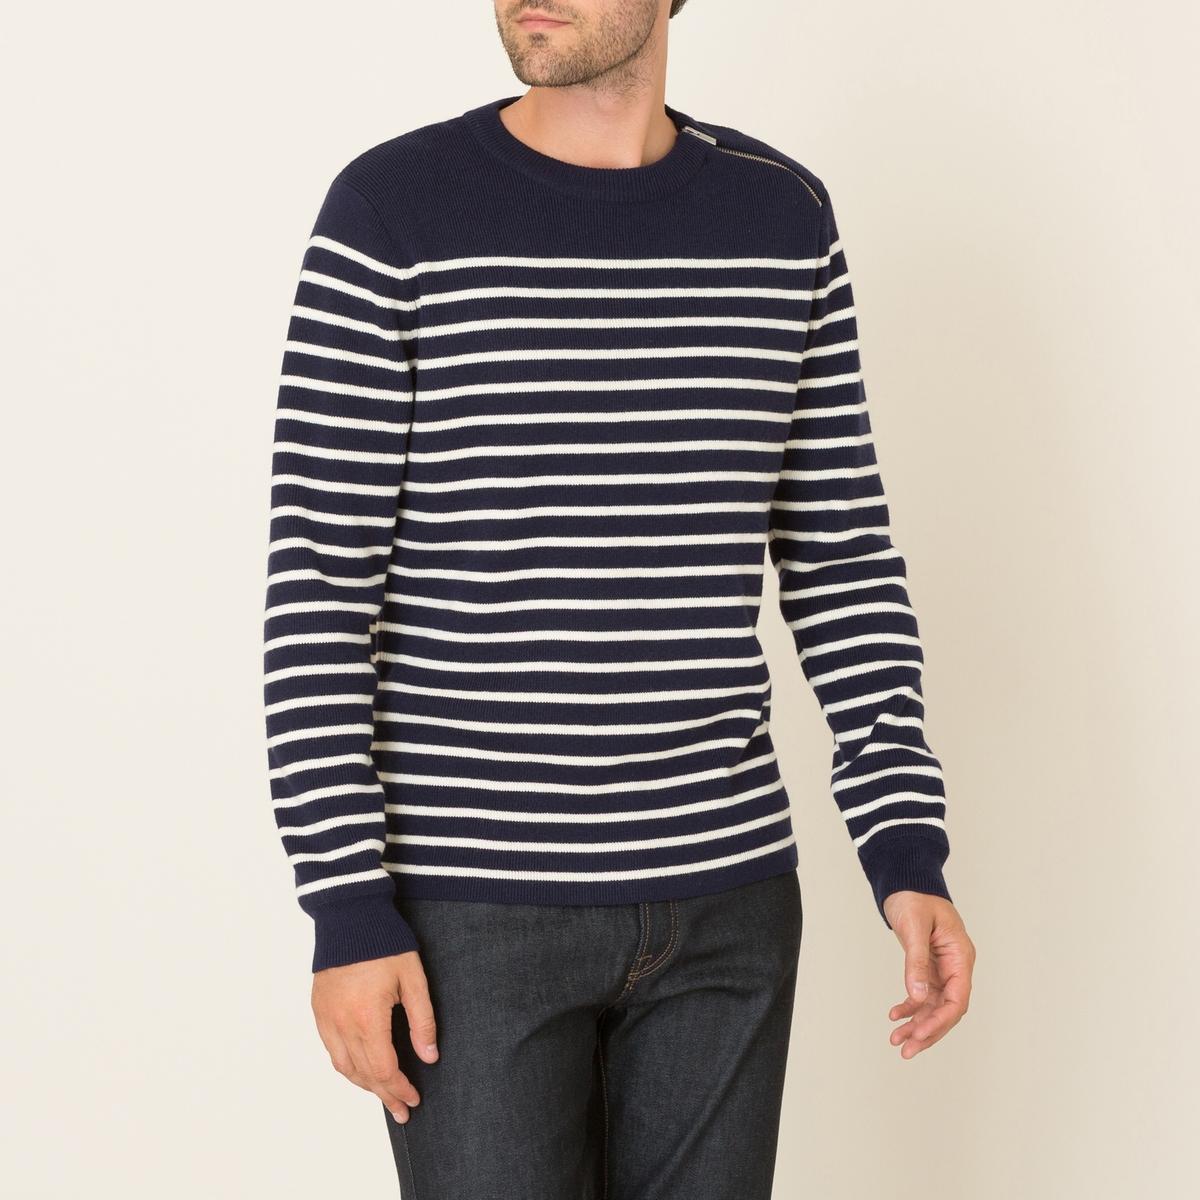 Пуловер в полоскуСостав и описание Материал : 70% шерсти, 30% хлопкаРубчик 69% шерсти, 30% хлопка, 1% эластанаМарка : THE KOOPLES SPORT<br><br>Цвет: темно-синий